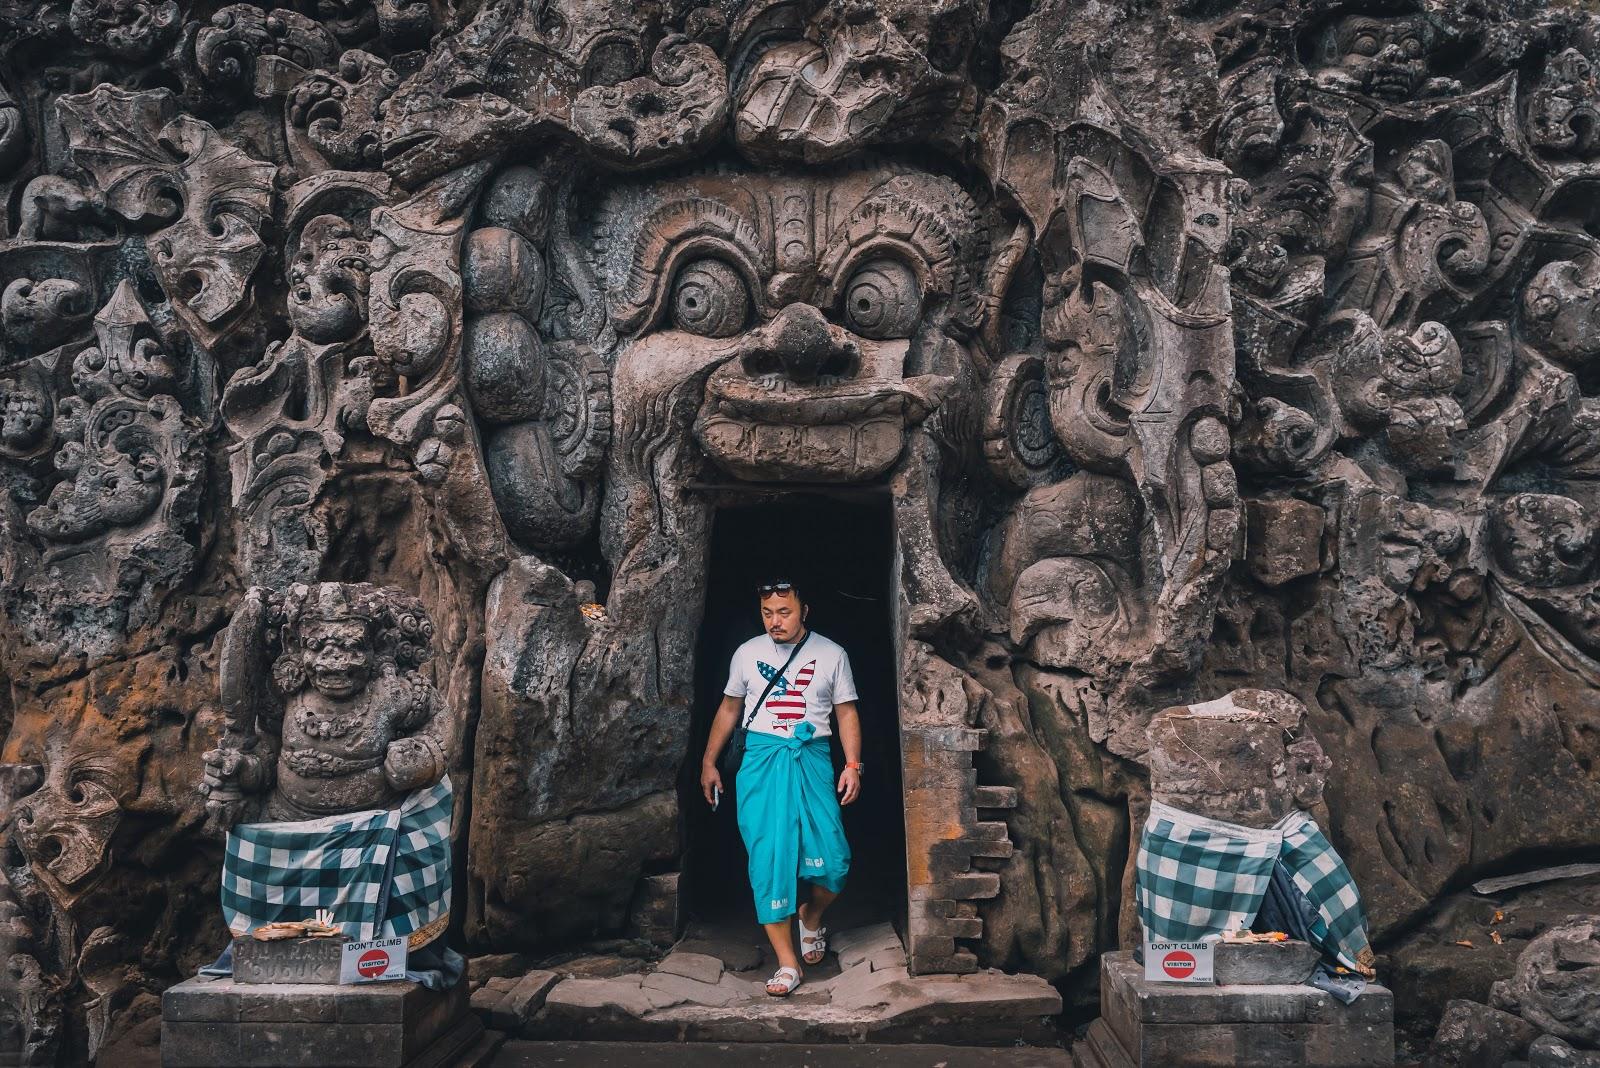 Entrance of Goa Lawha temple